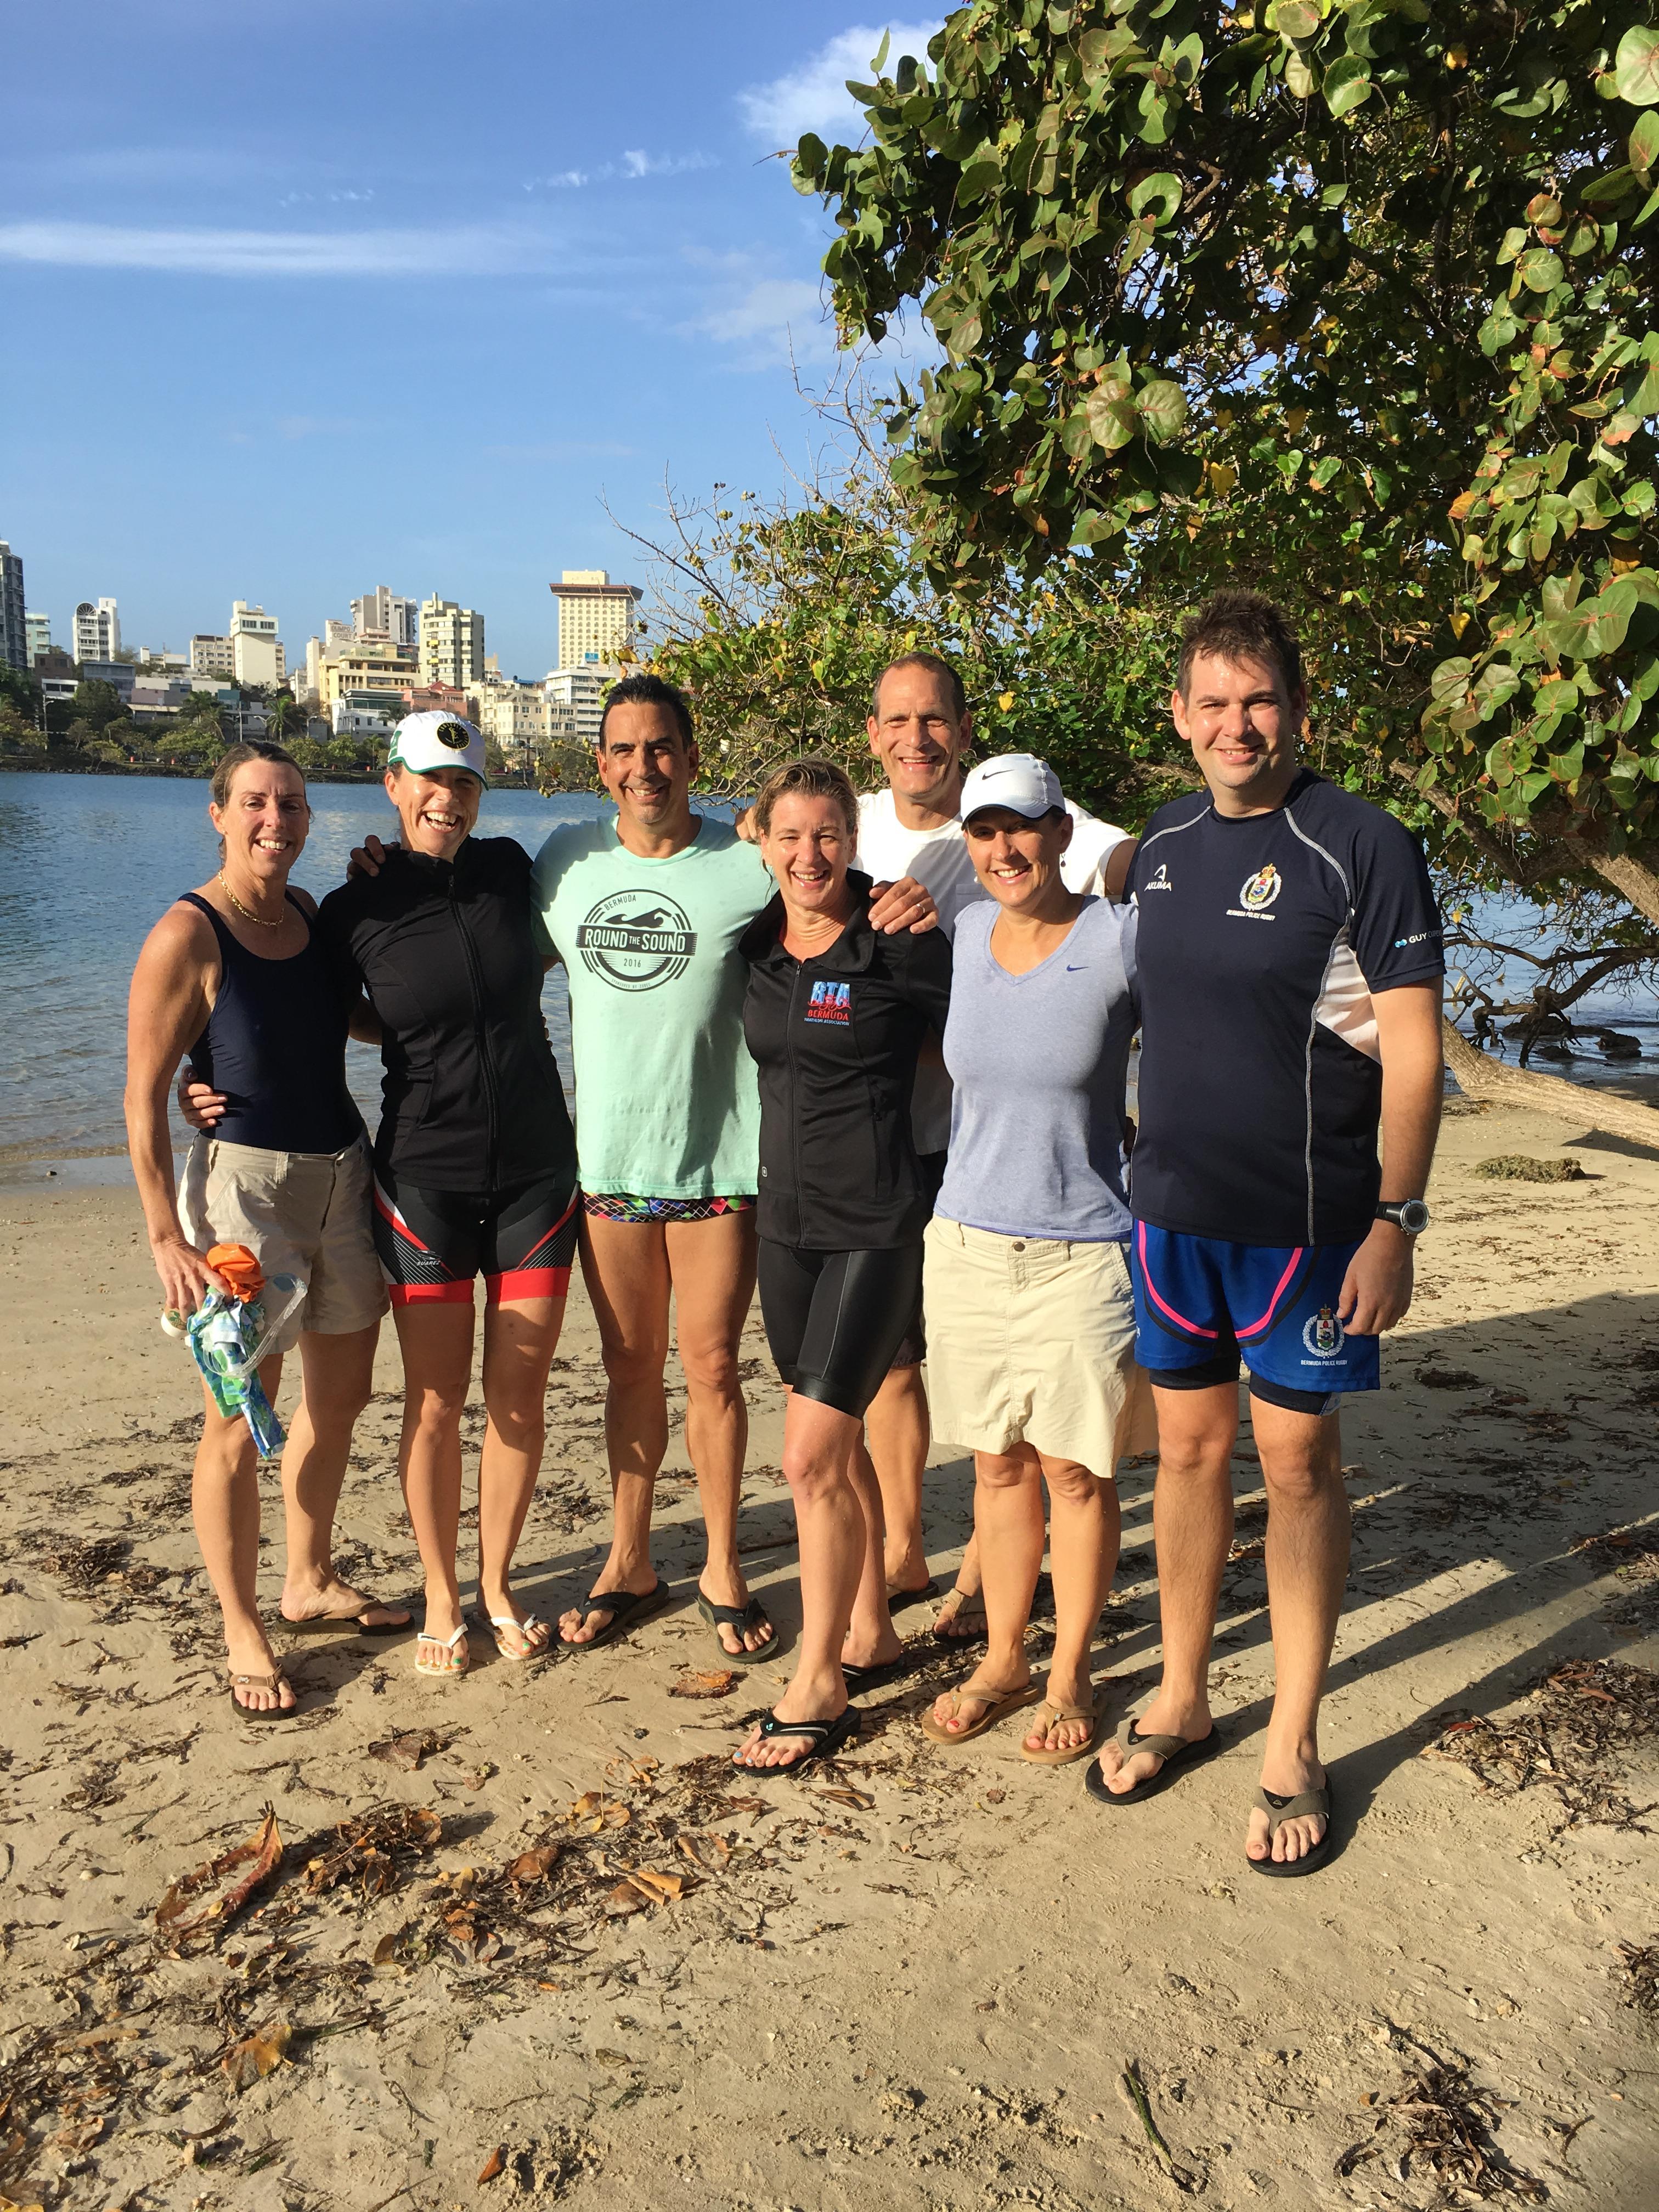 puerto rico athletes.JPG